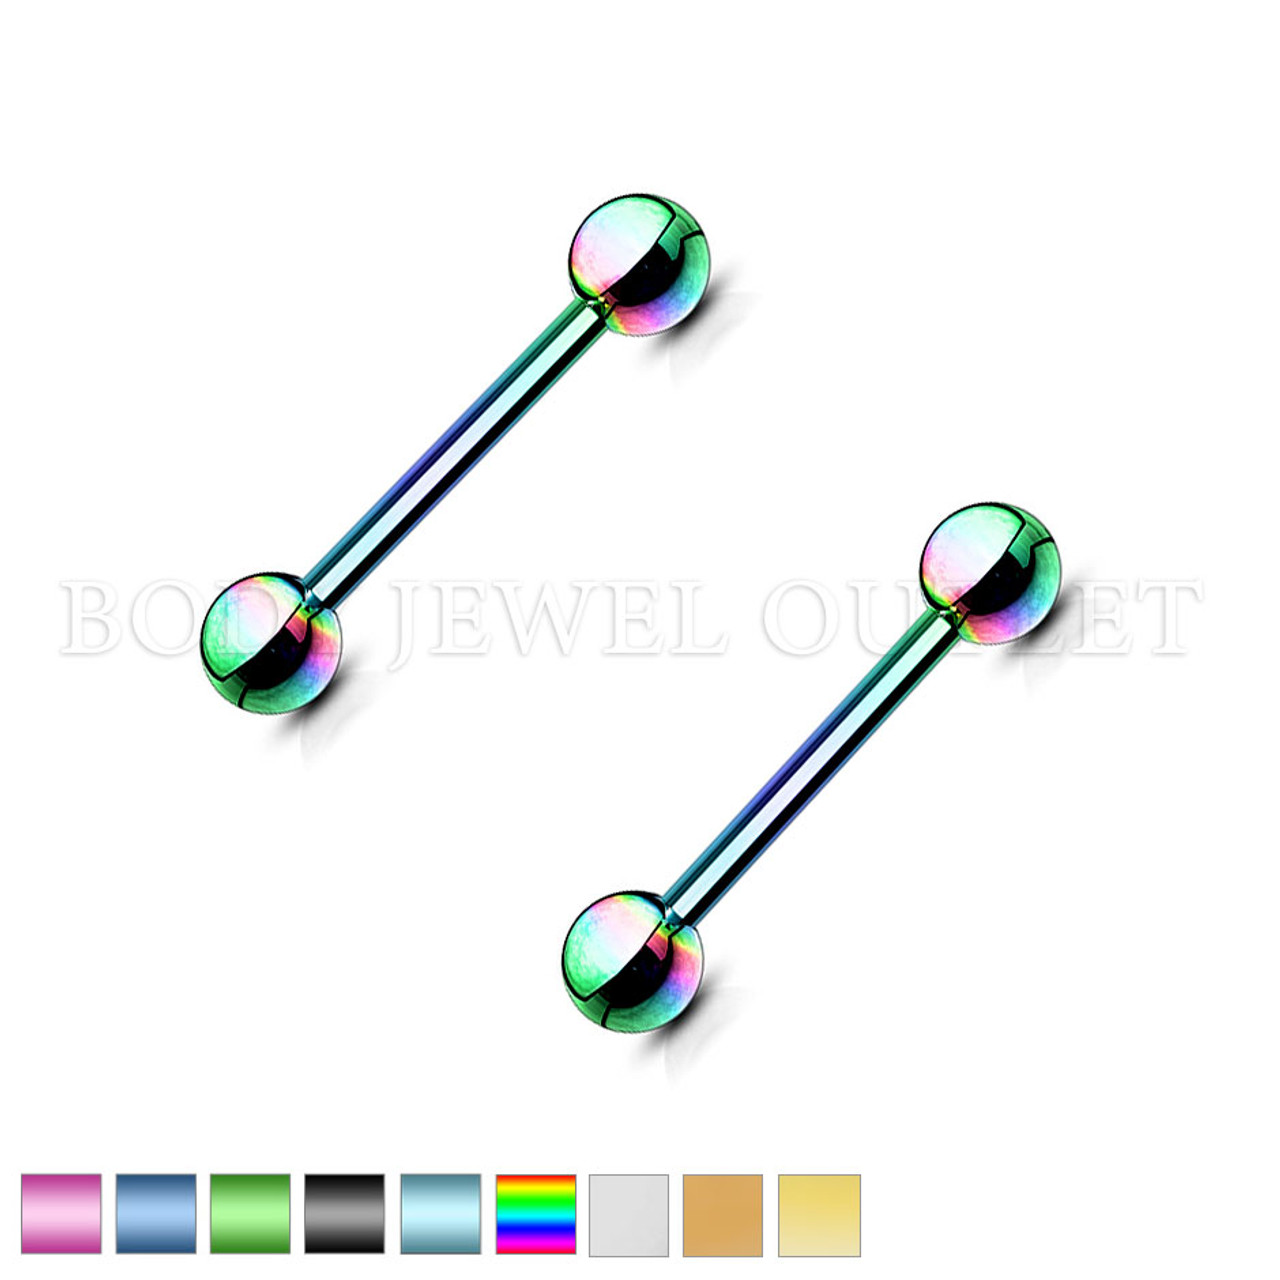 Nipple Piercing Rainbow Steel Straight Bar | BodyJewelOutlet